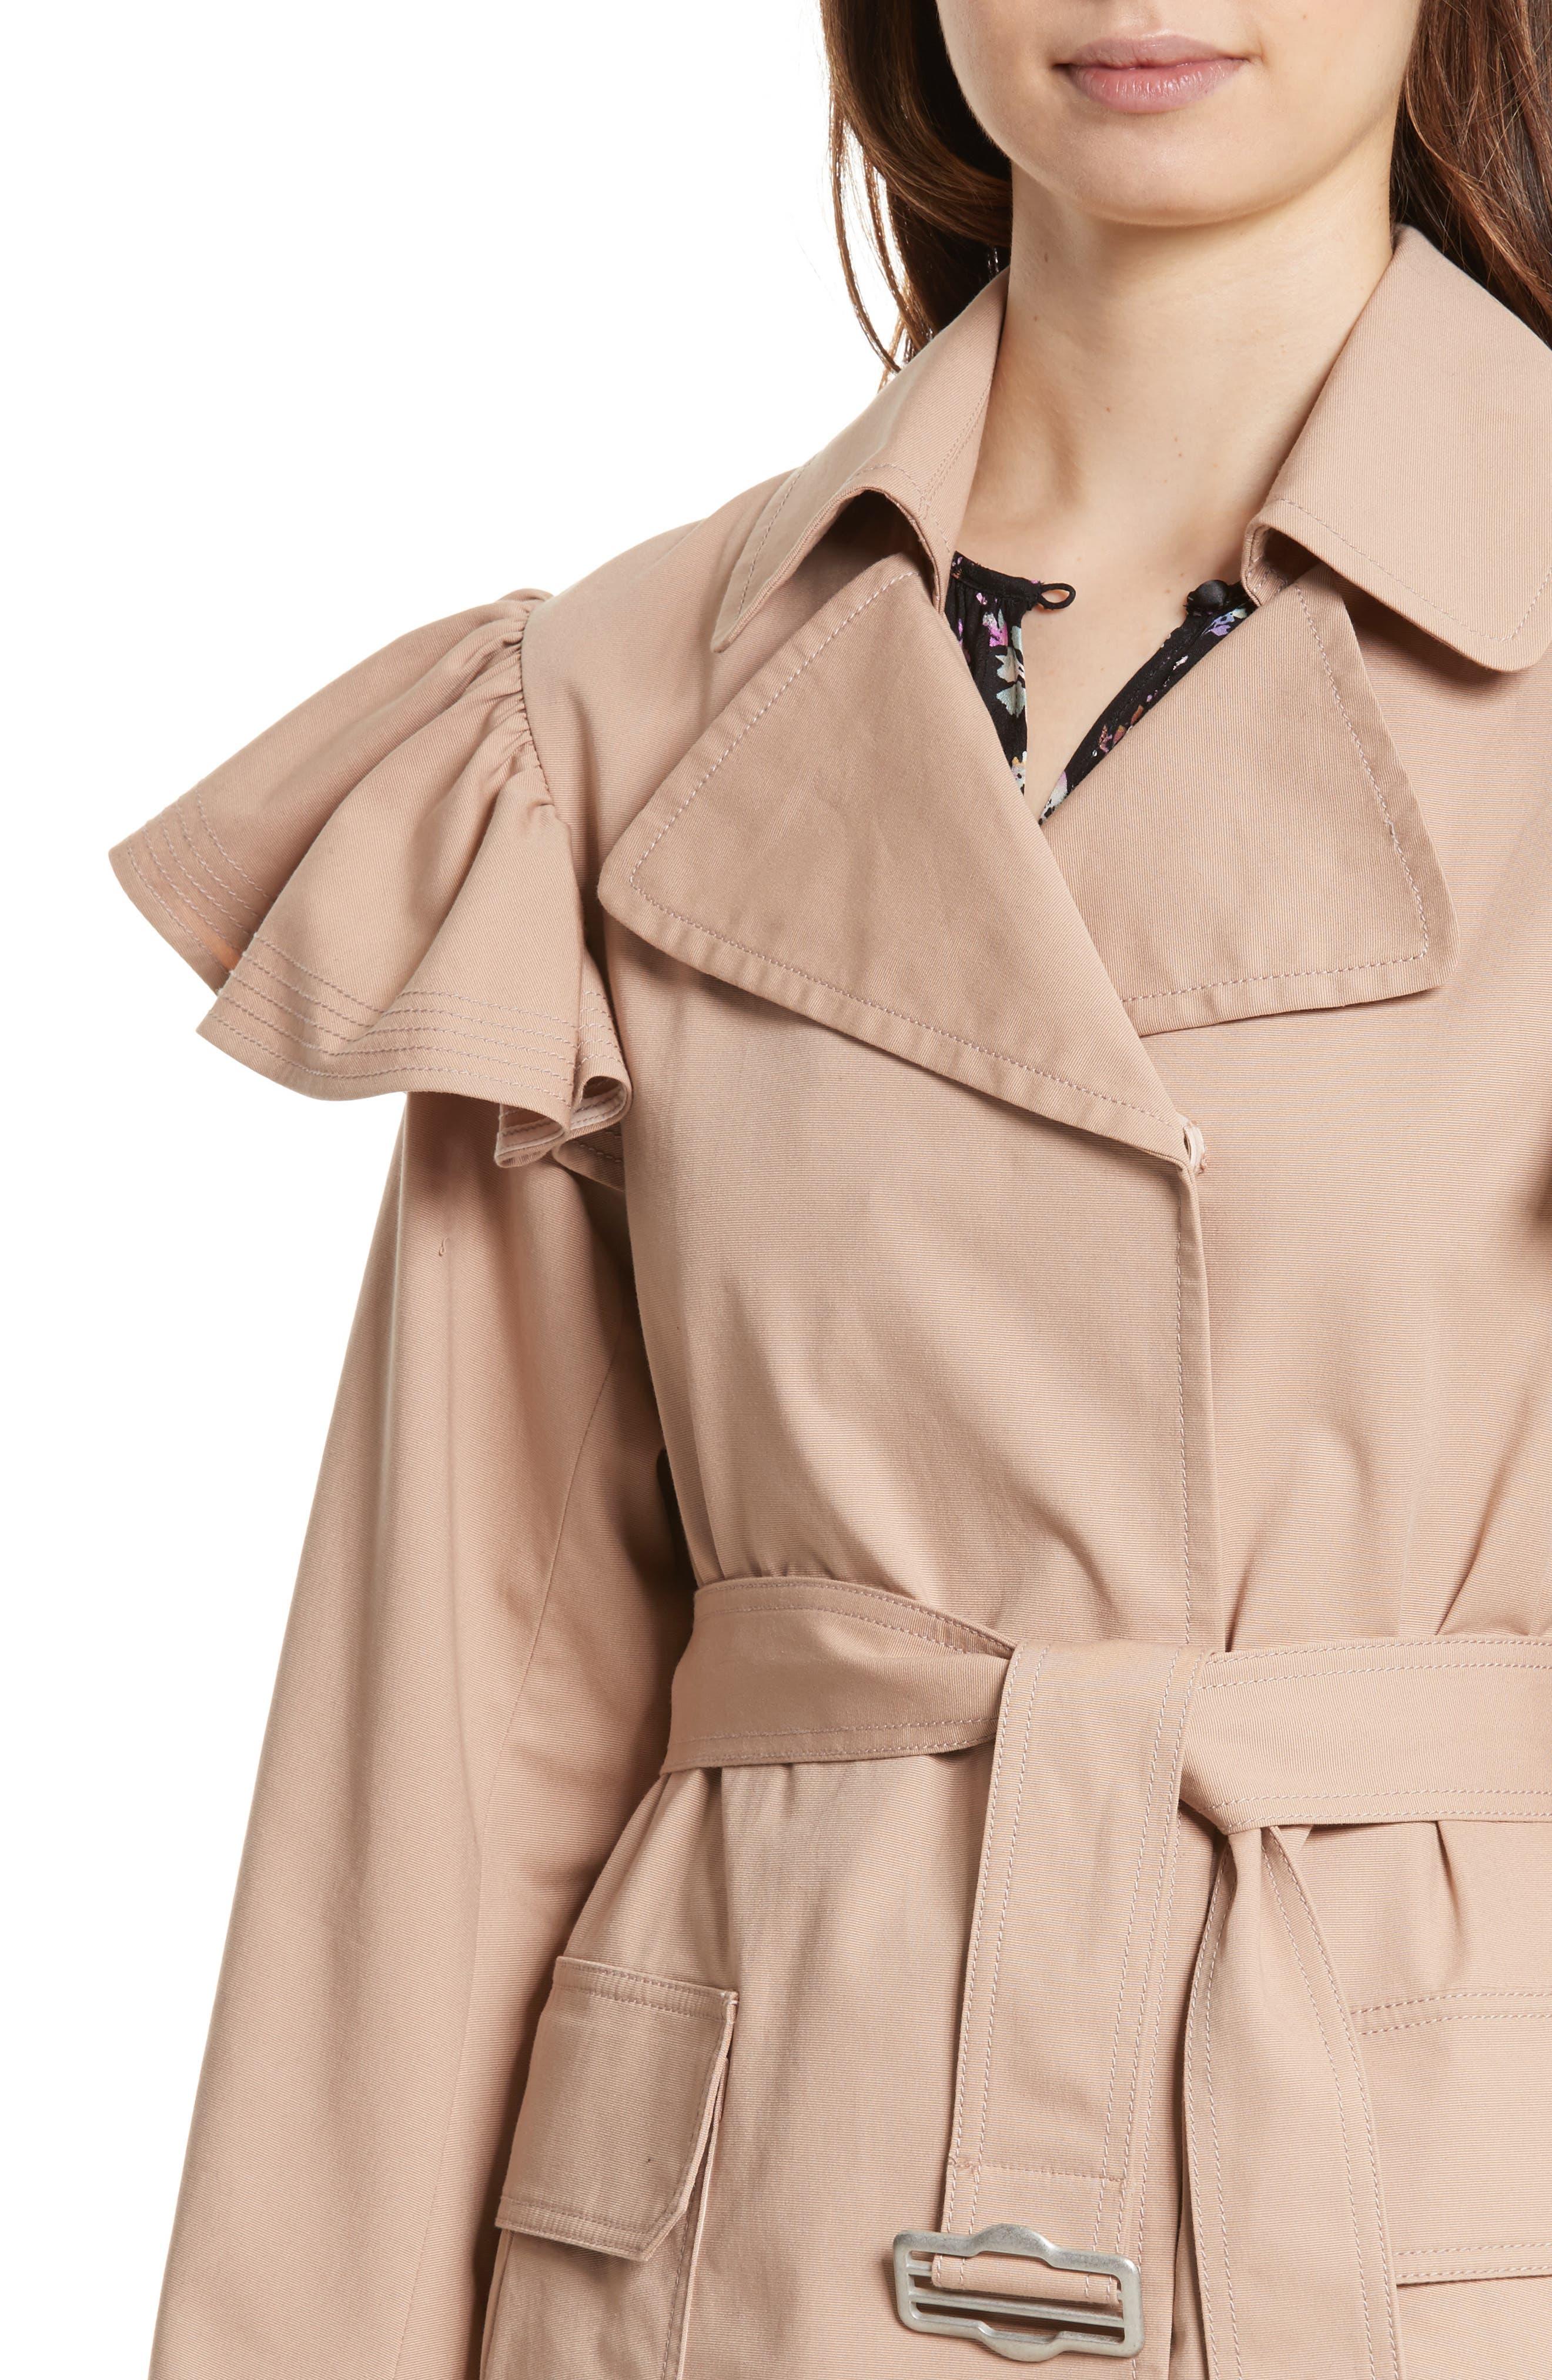 Ruffle Trim Trench Coat,                             Alternate thumbnail 4, color,                             285